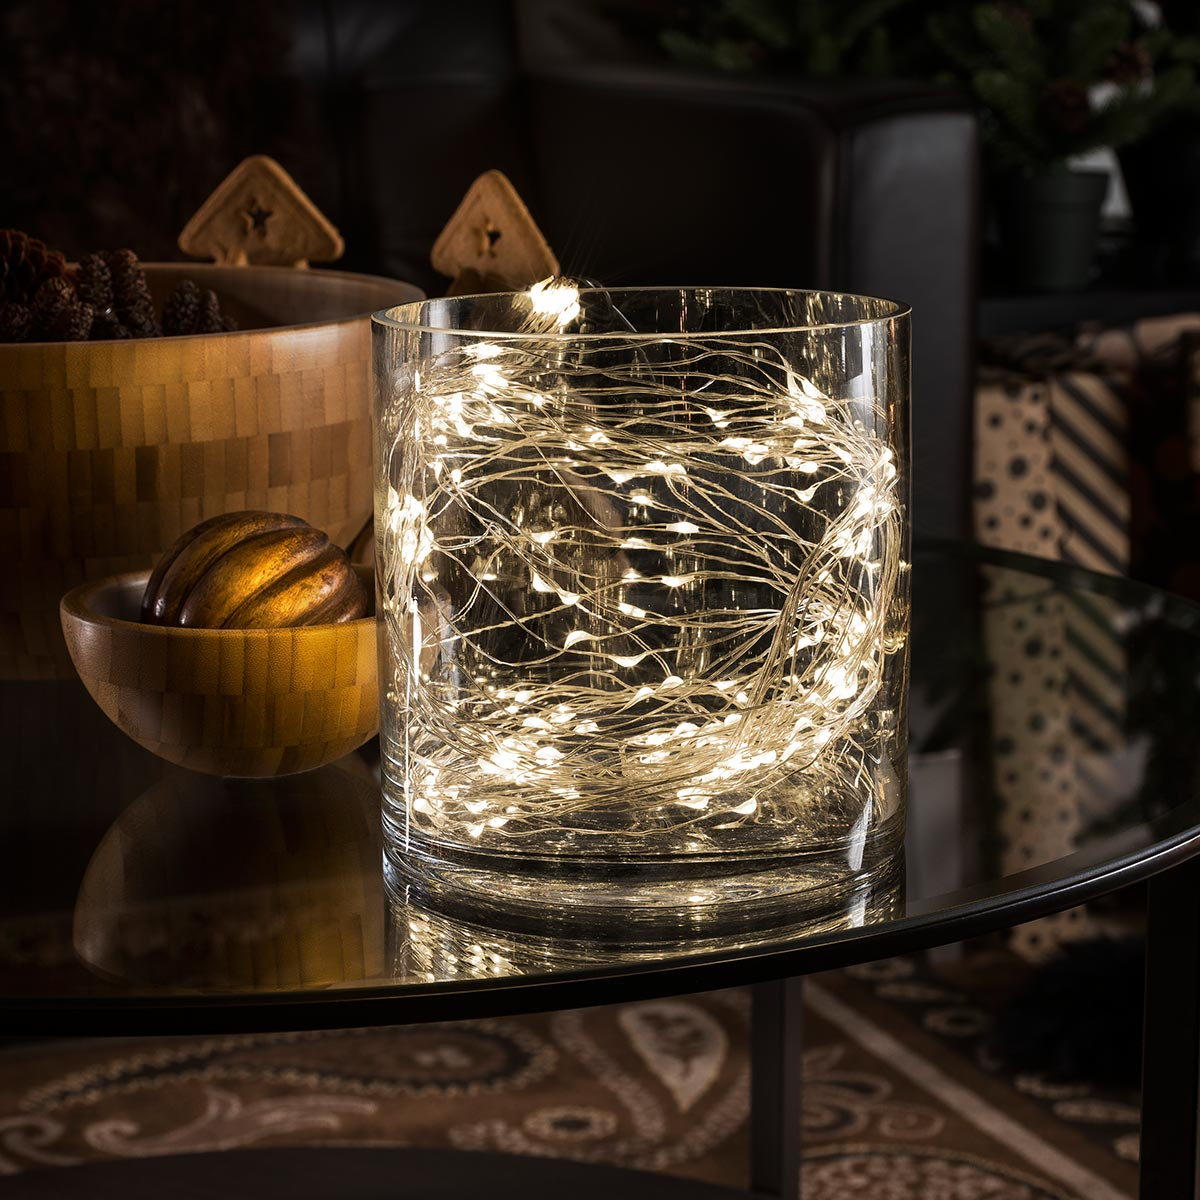 led tropfenlametta 10 str nge 2m 20 warmweissen dioden. Black Bedroom Furniture Sets. Home Design Ideas